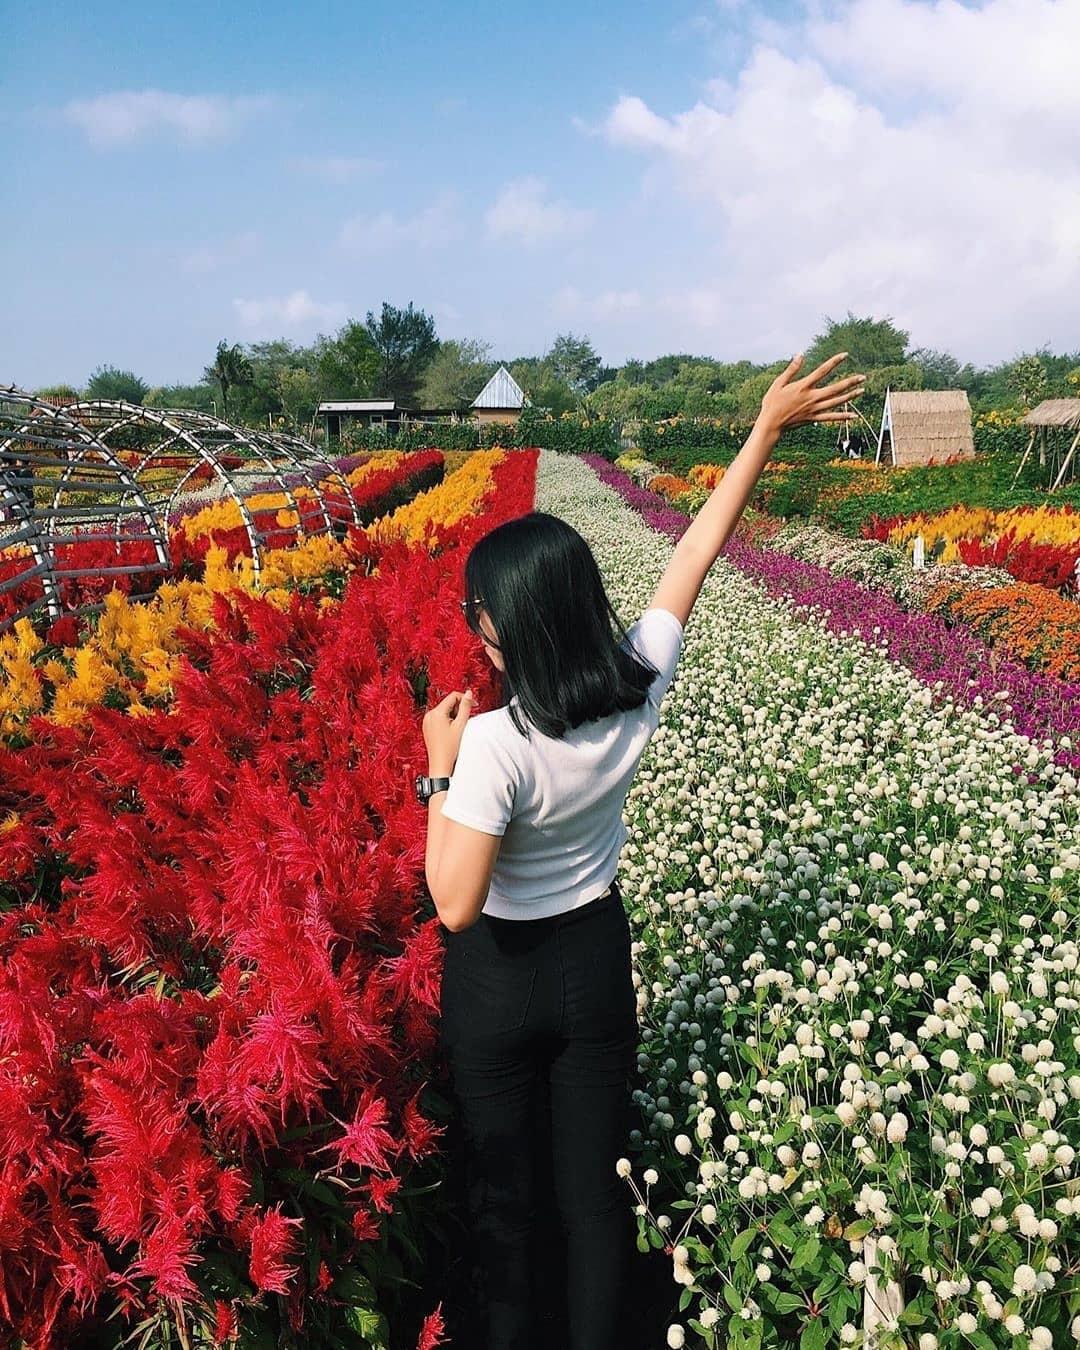 Harga Tiket Masuk Taman Bunga Romatic Garden Bantul